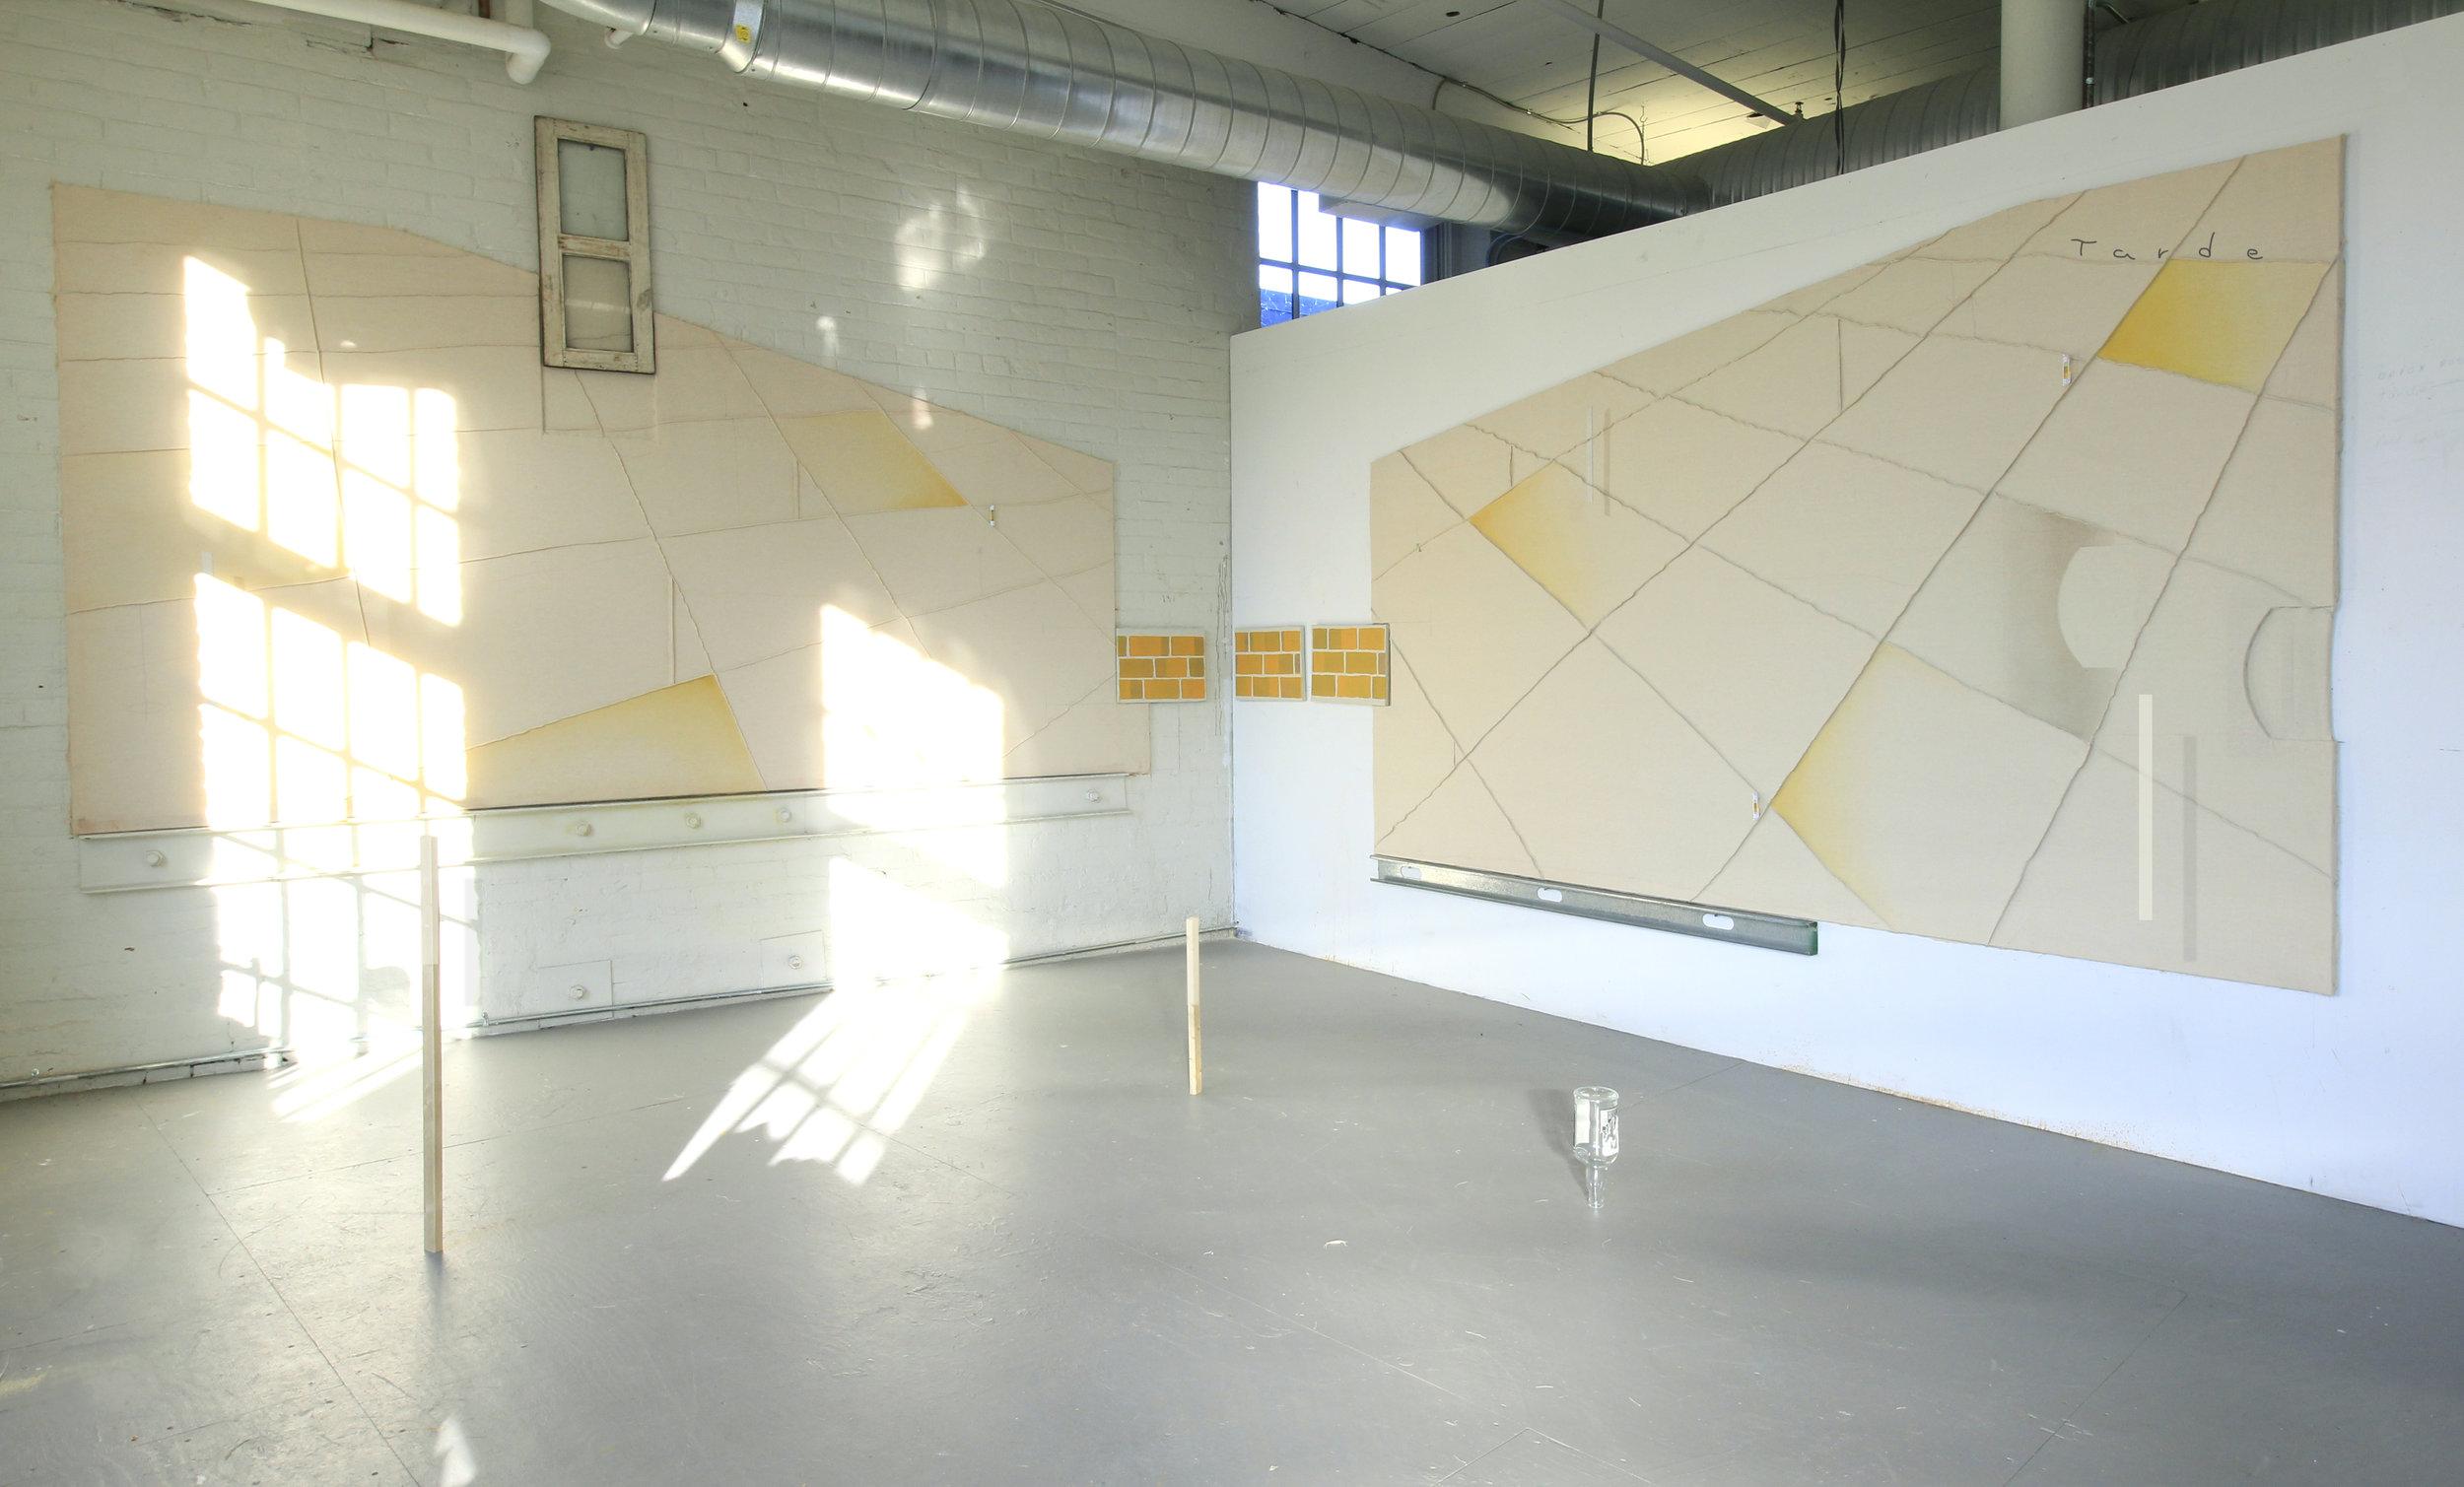 Aproximate Position of the Sun. At Mass Moca studios